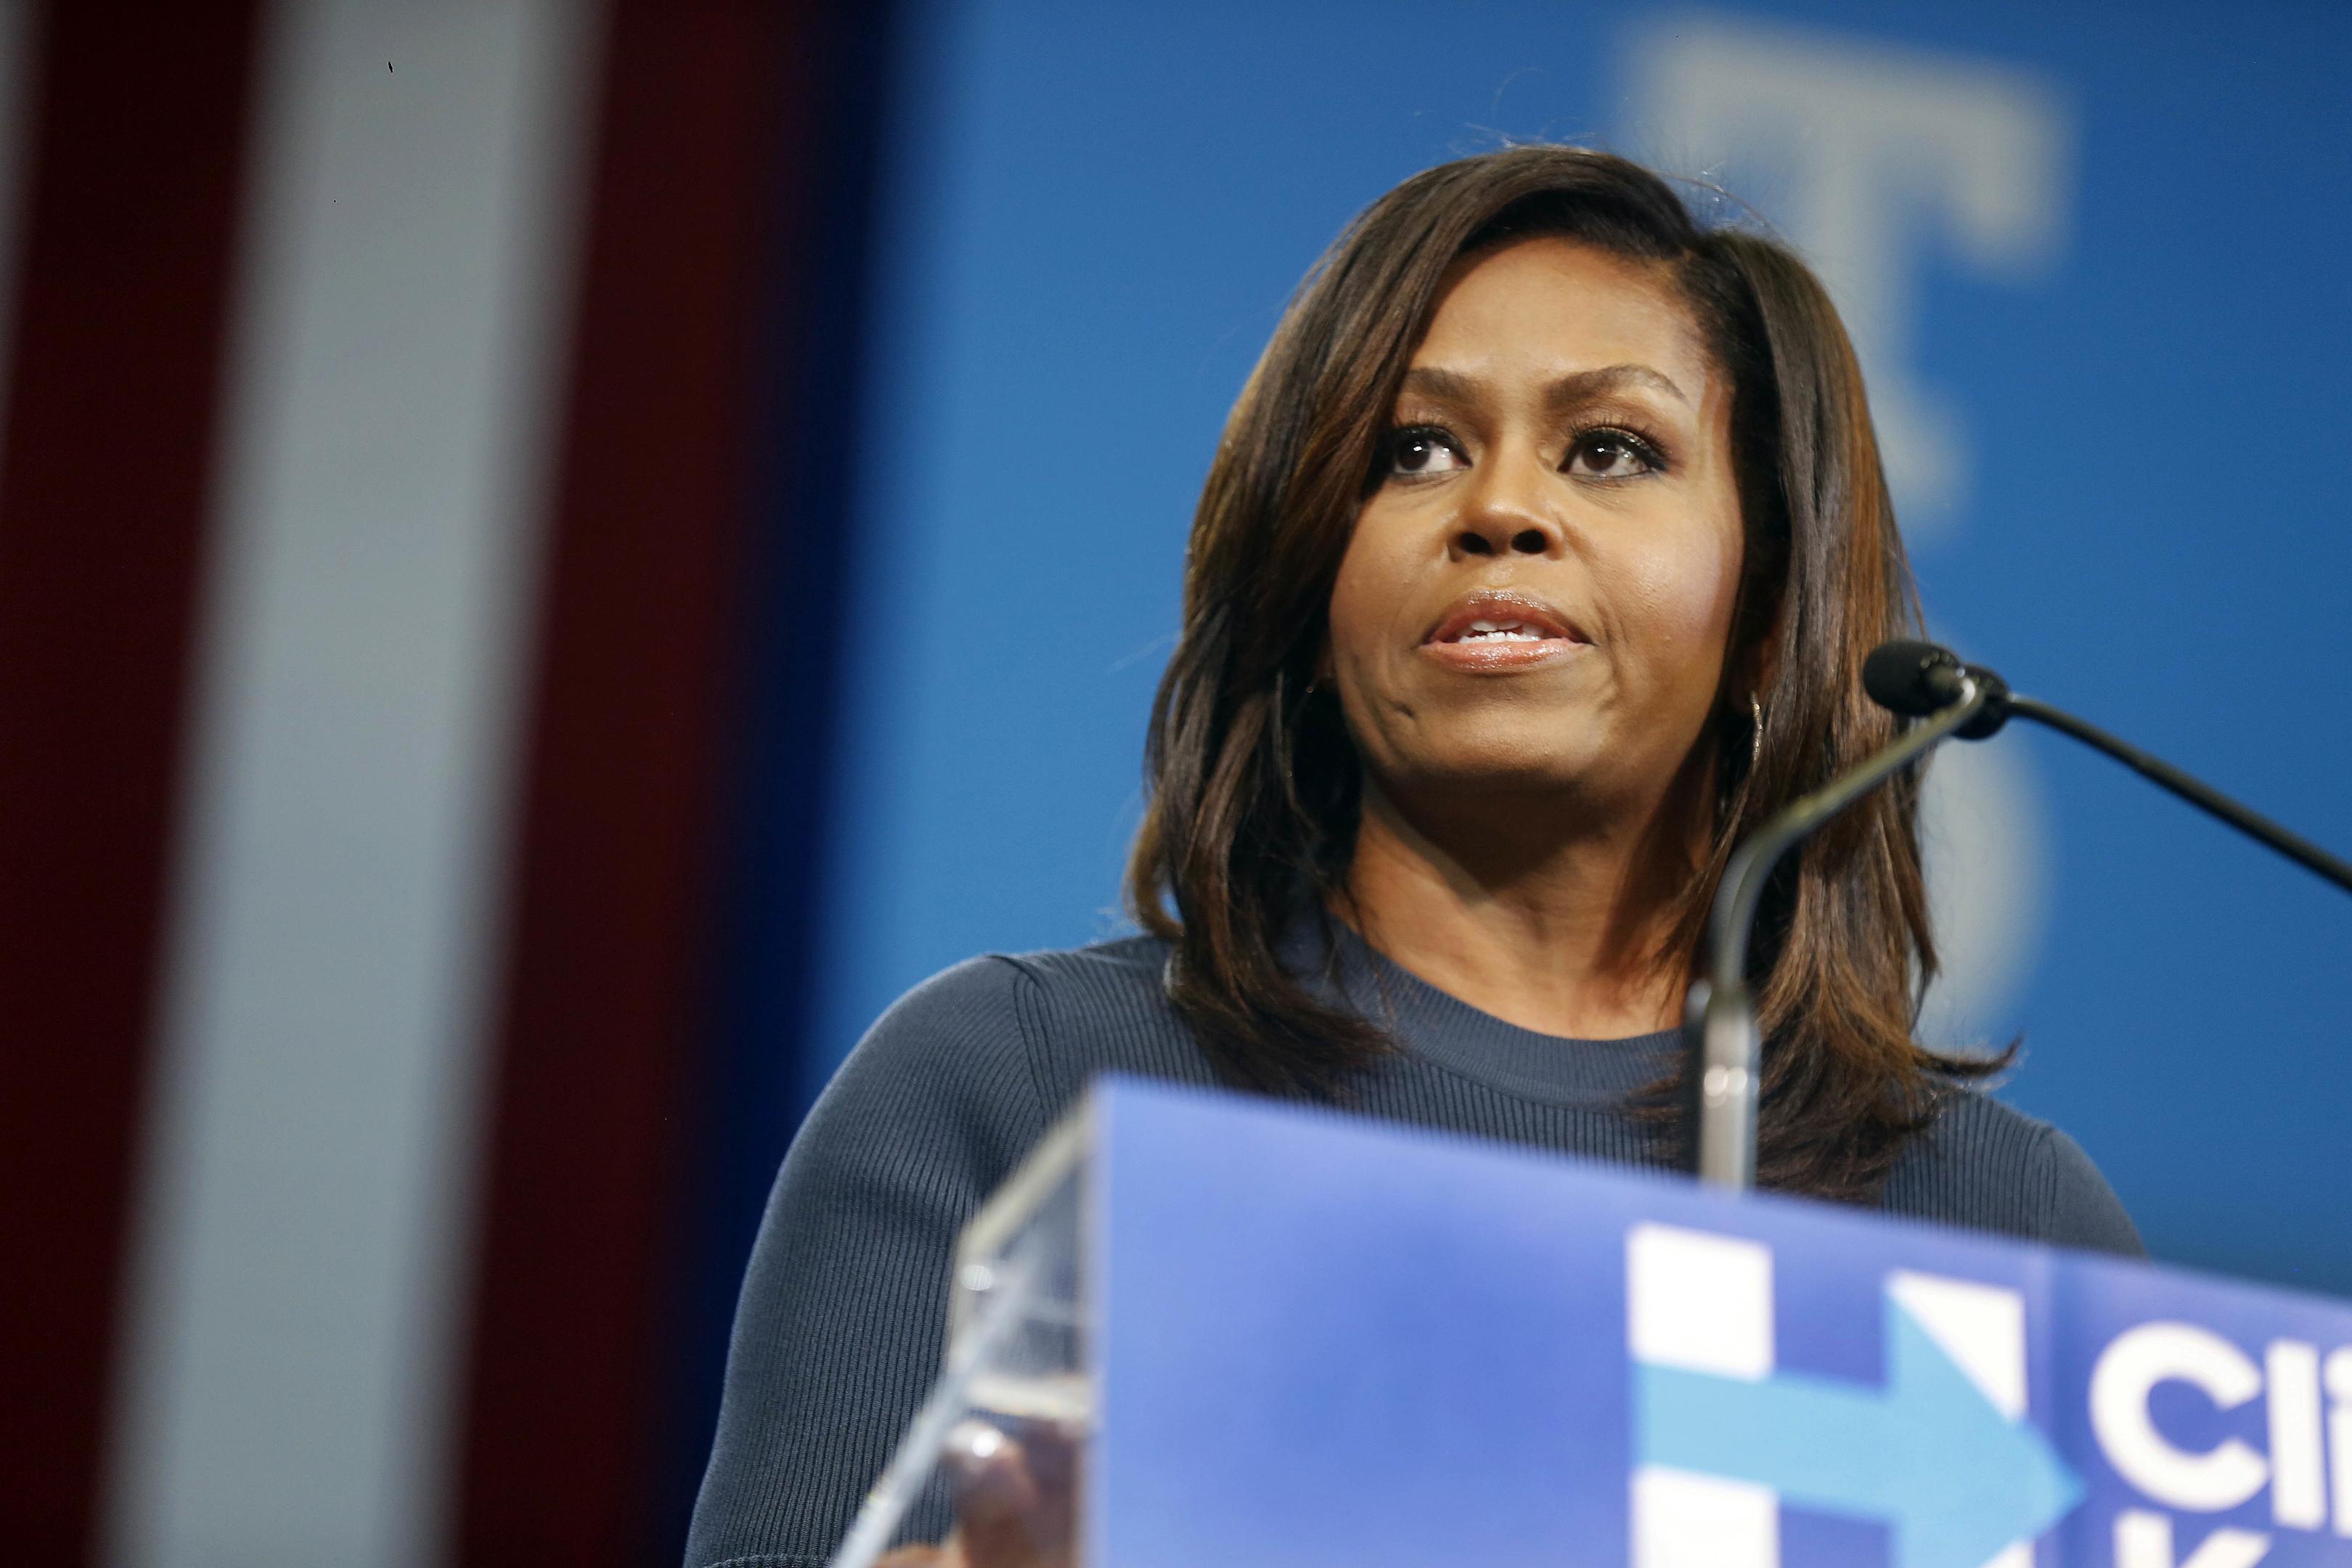 First lady Michelle Obama (AP Photo/Jim Cole)